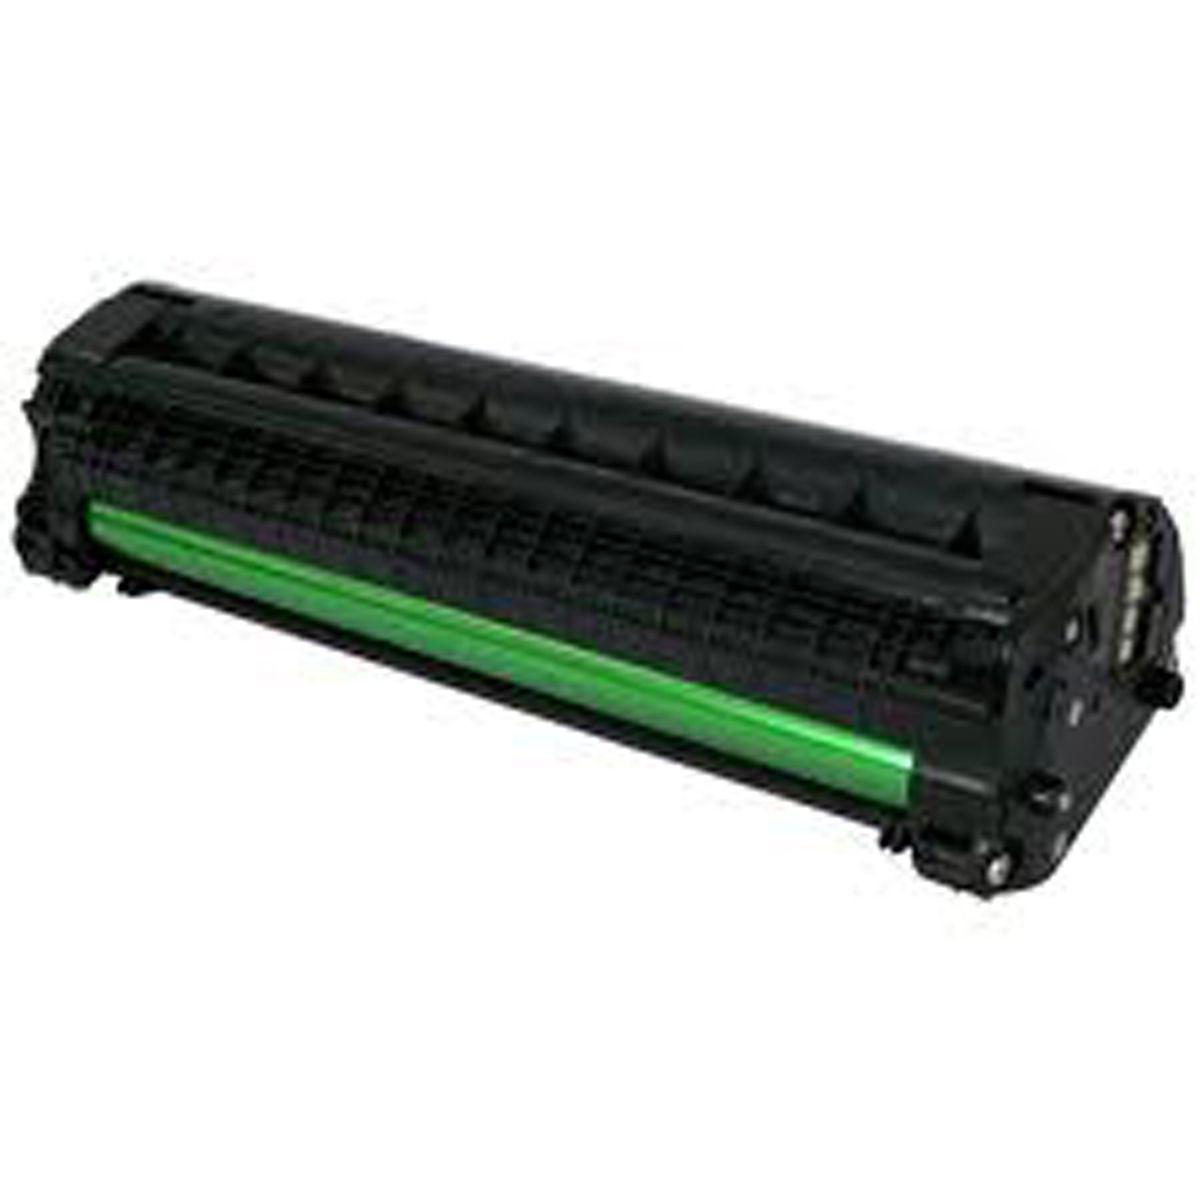 Toner Compativel D104S D104 104 - ML1665 ML1660 SCX3200 SCX3217 SCX3205 T2-041B-5KYF